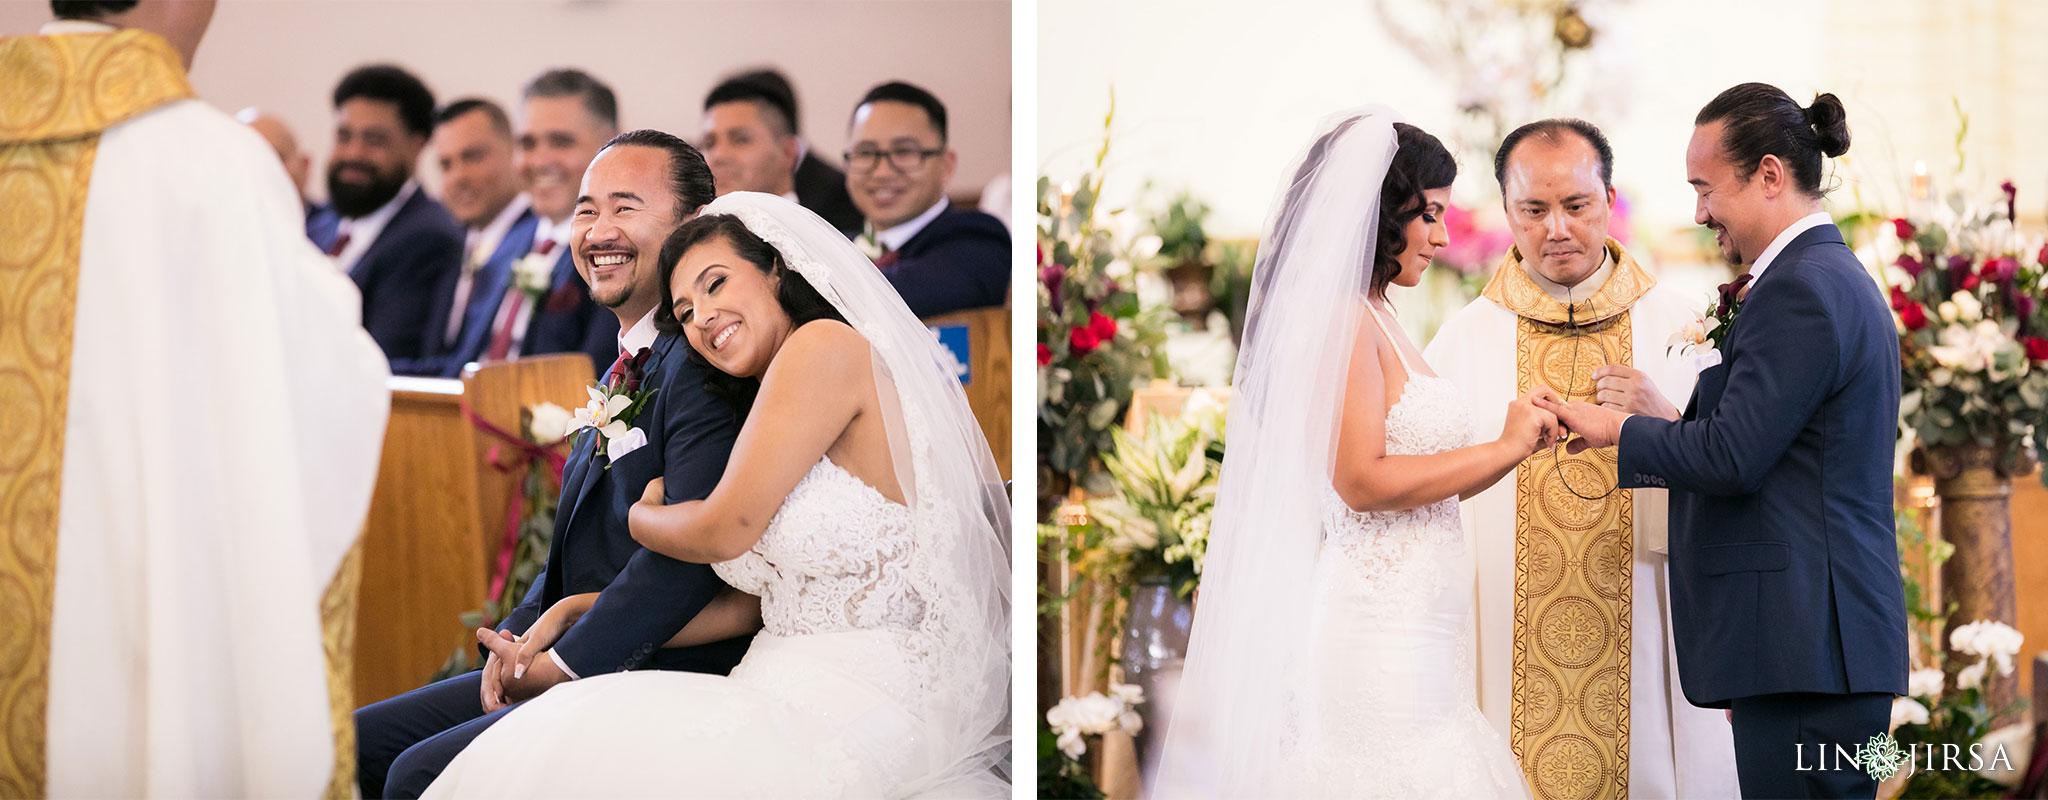 14 st anthony claret church orange county wedding ceremony photography